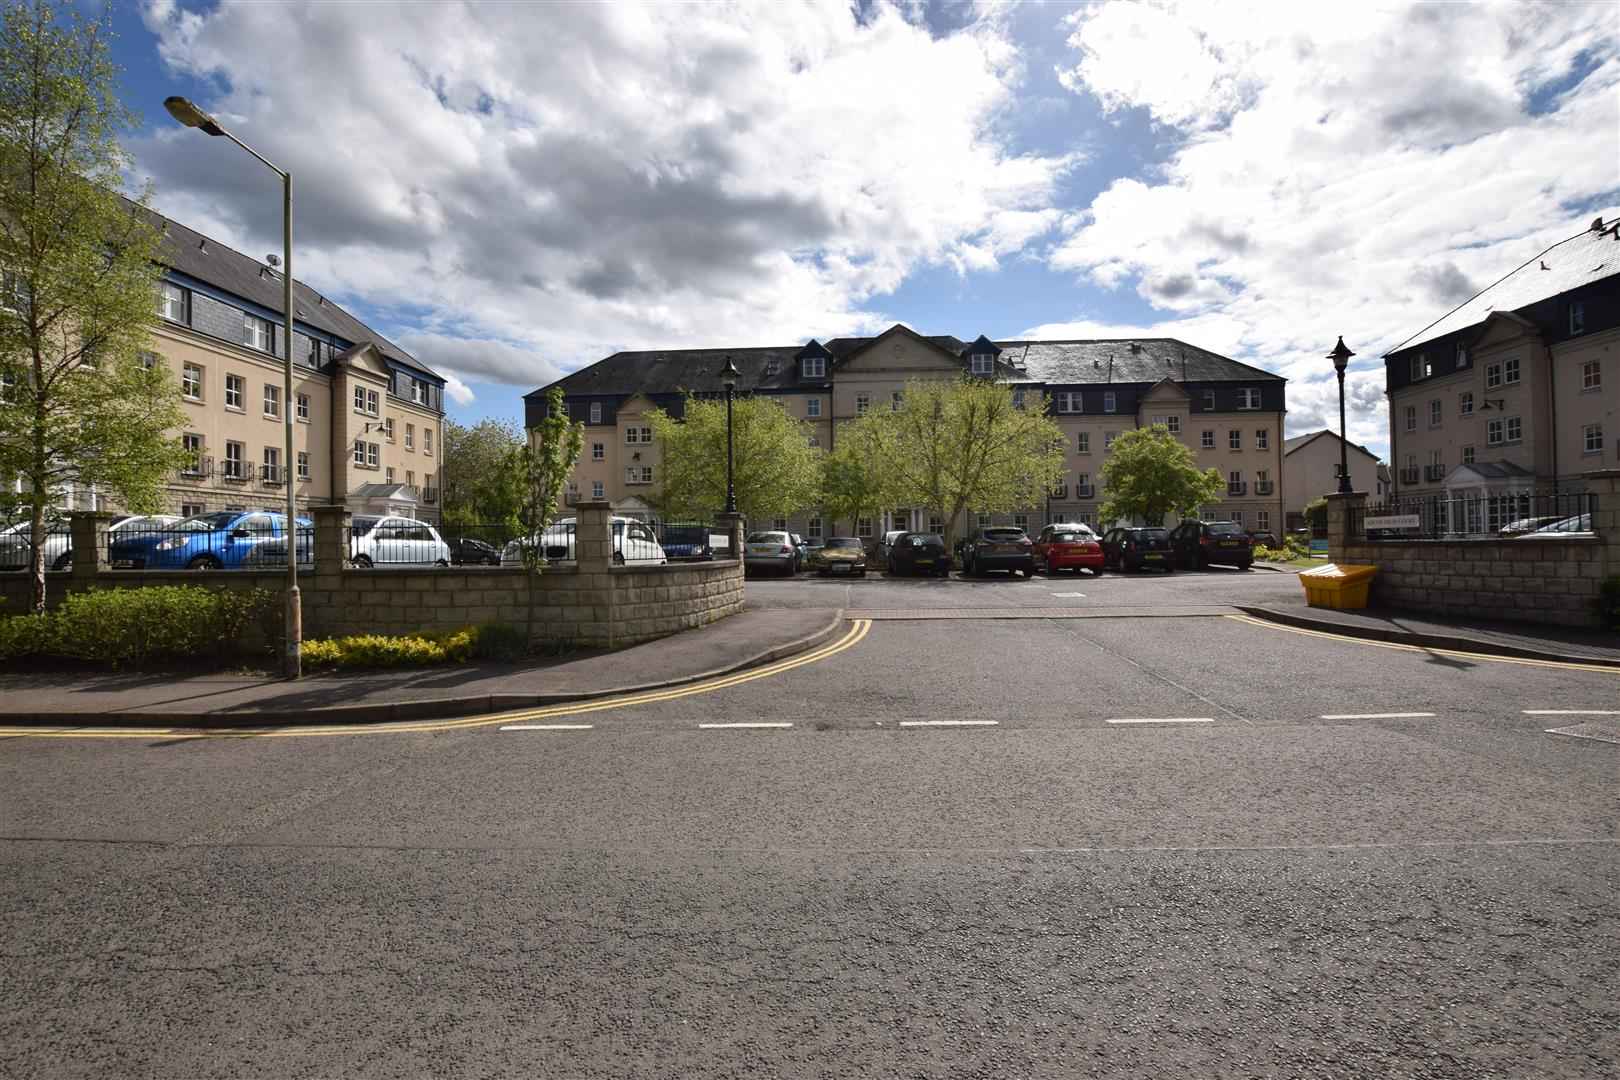 4D, South Inch Court, Perth, Perthshire, PH2 8BG, UK